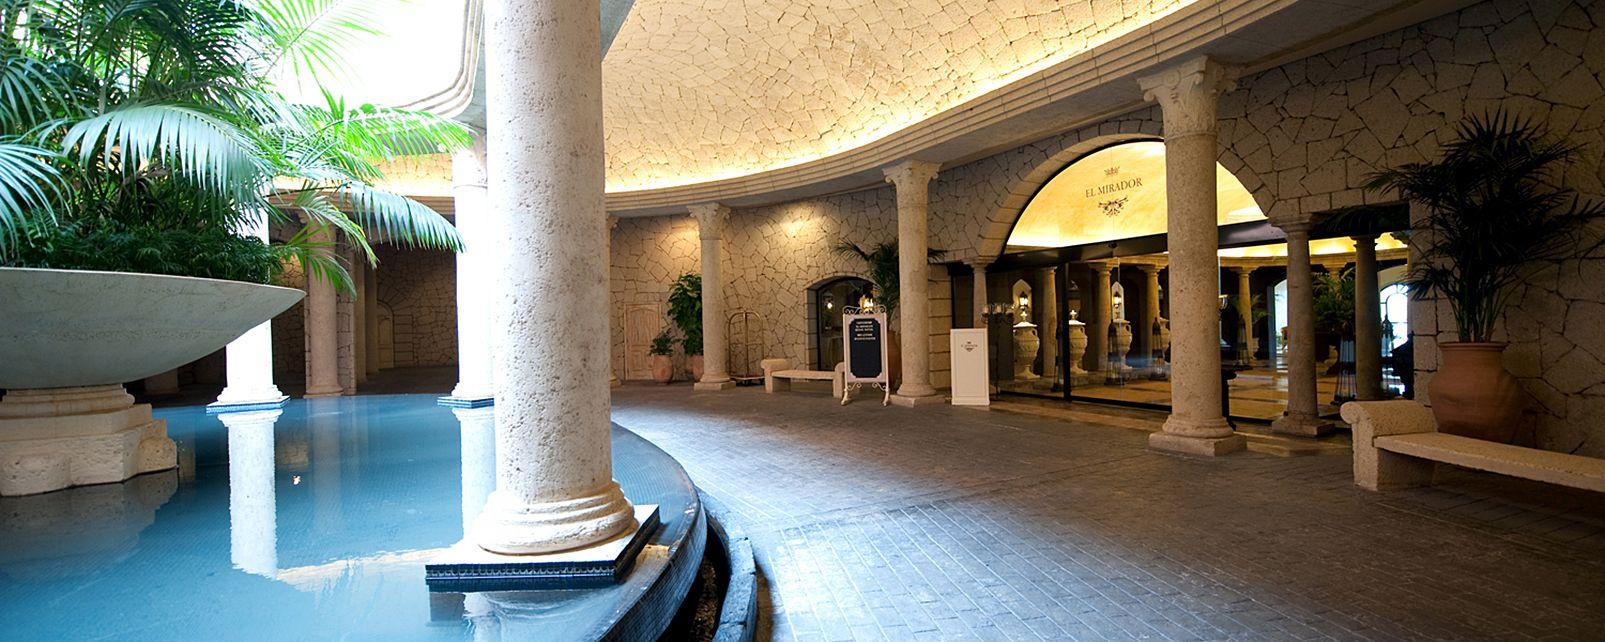 Hôtel Iberostar Grand Hotel El Mirador